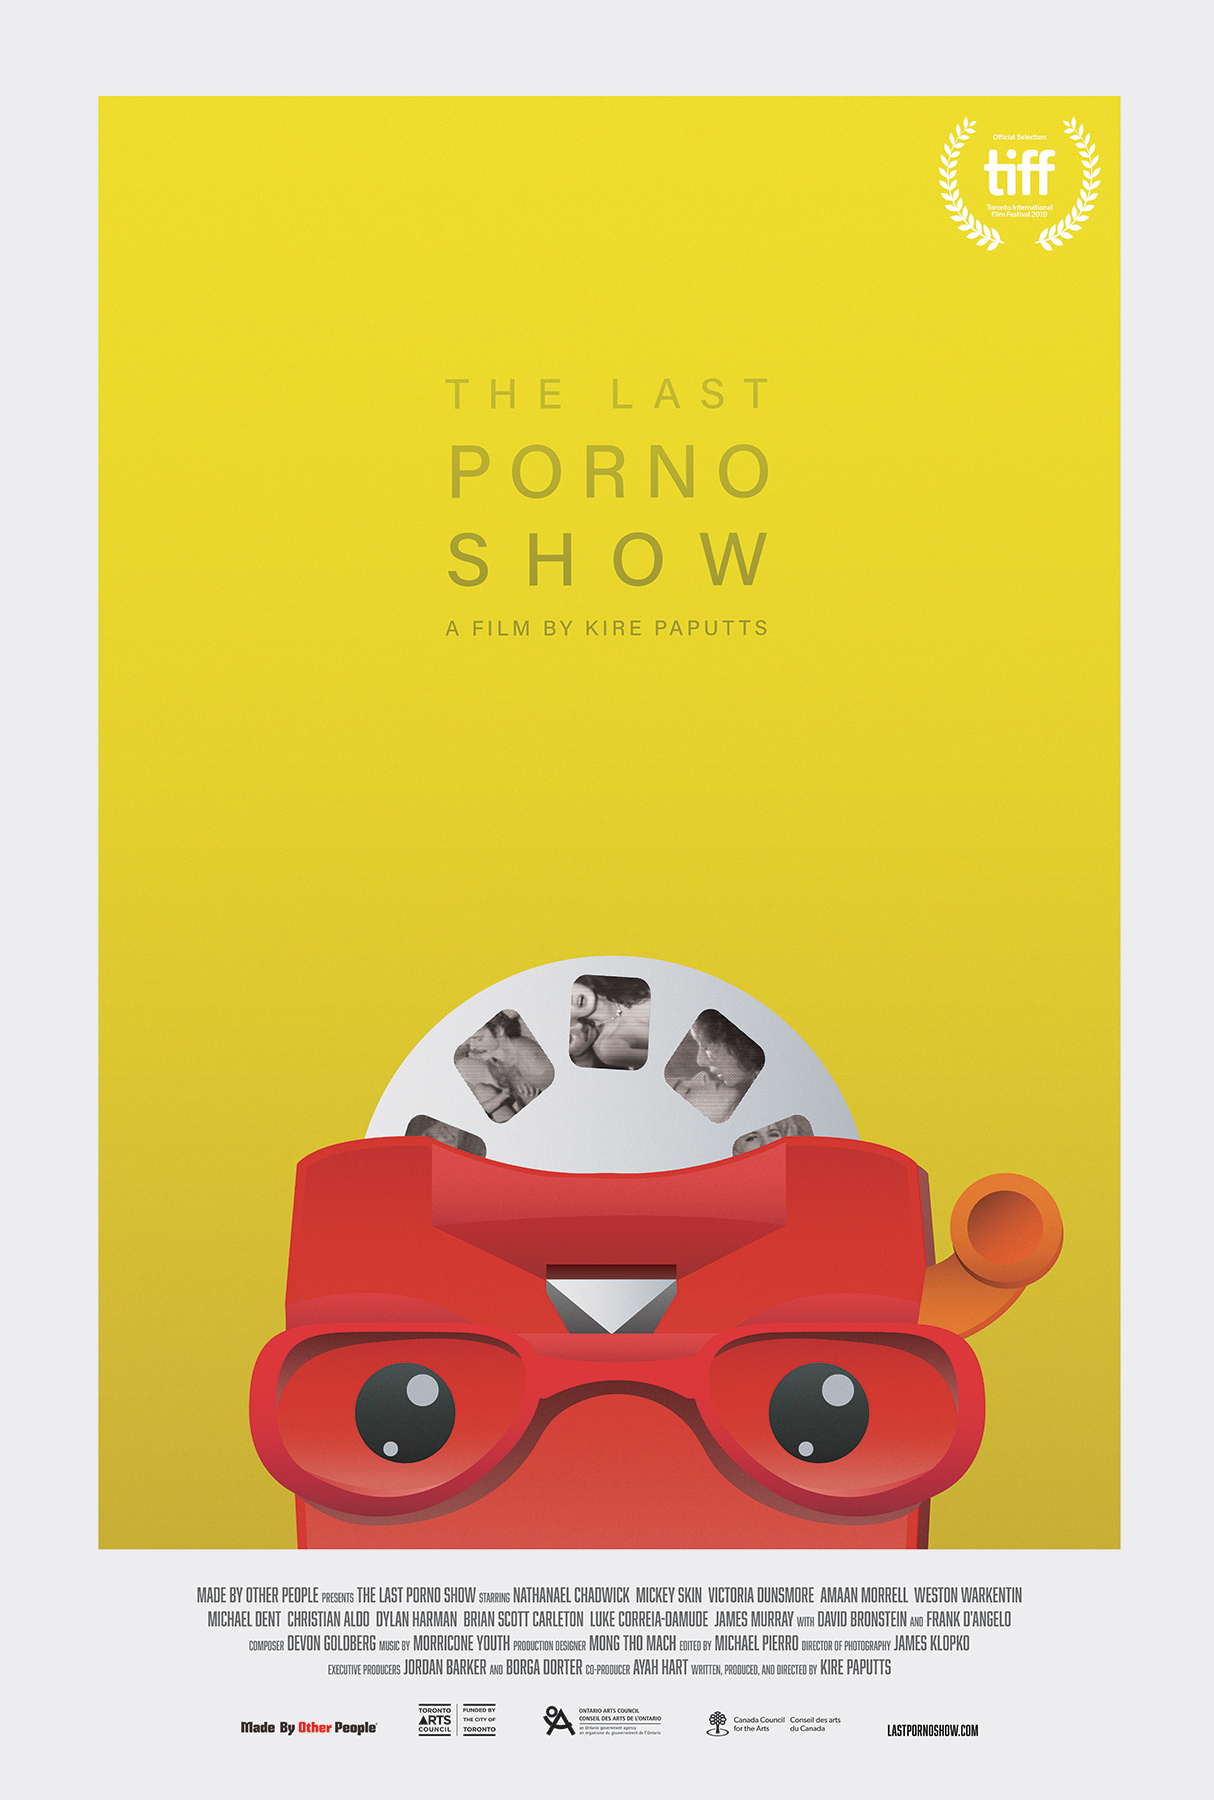 Poster for The Last Porno Show